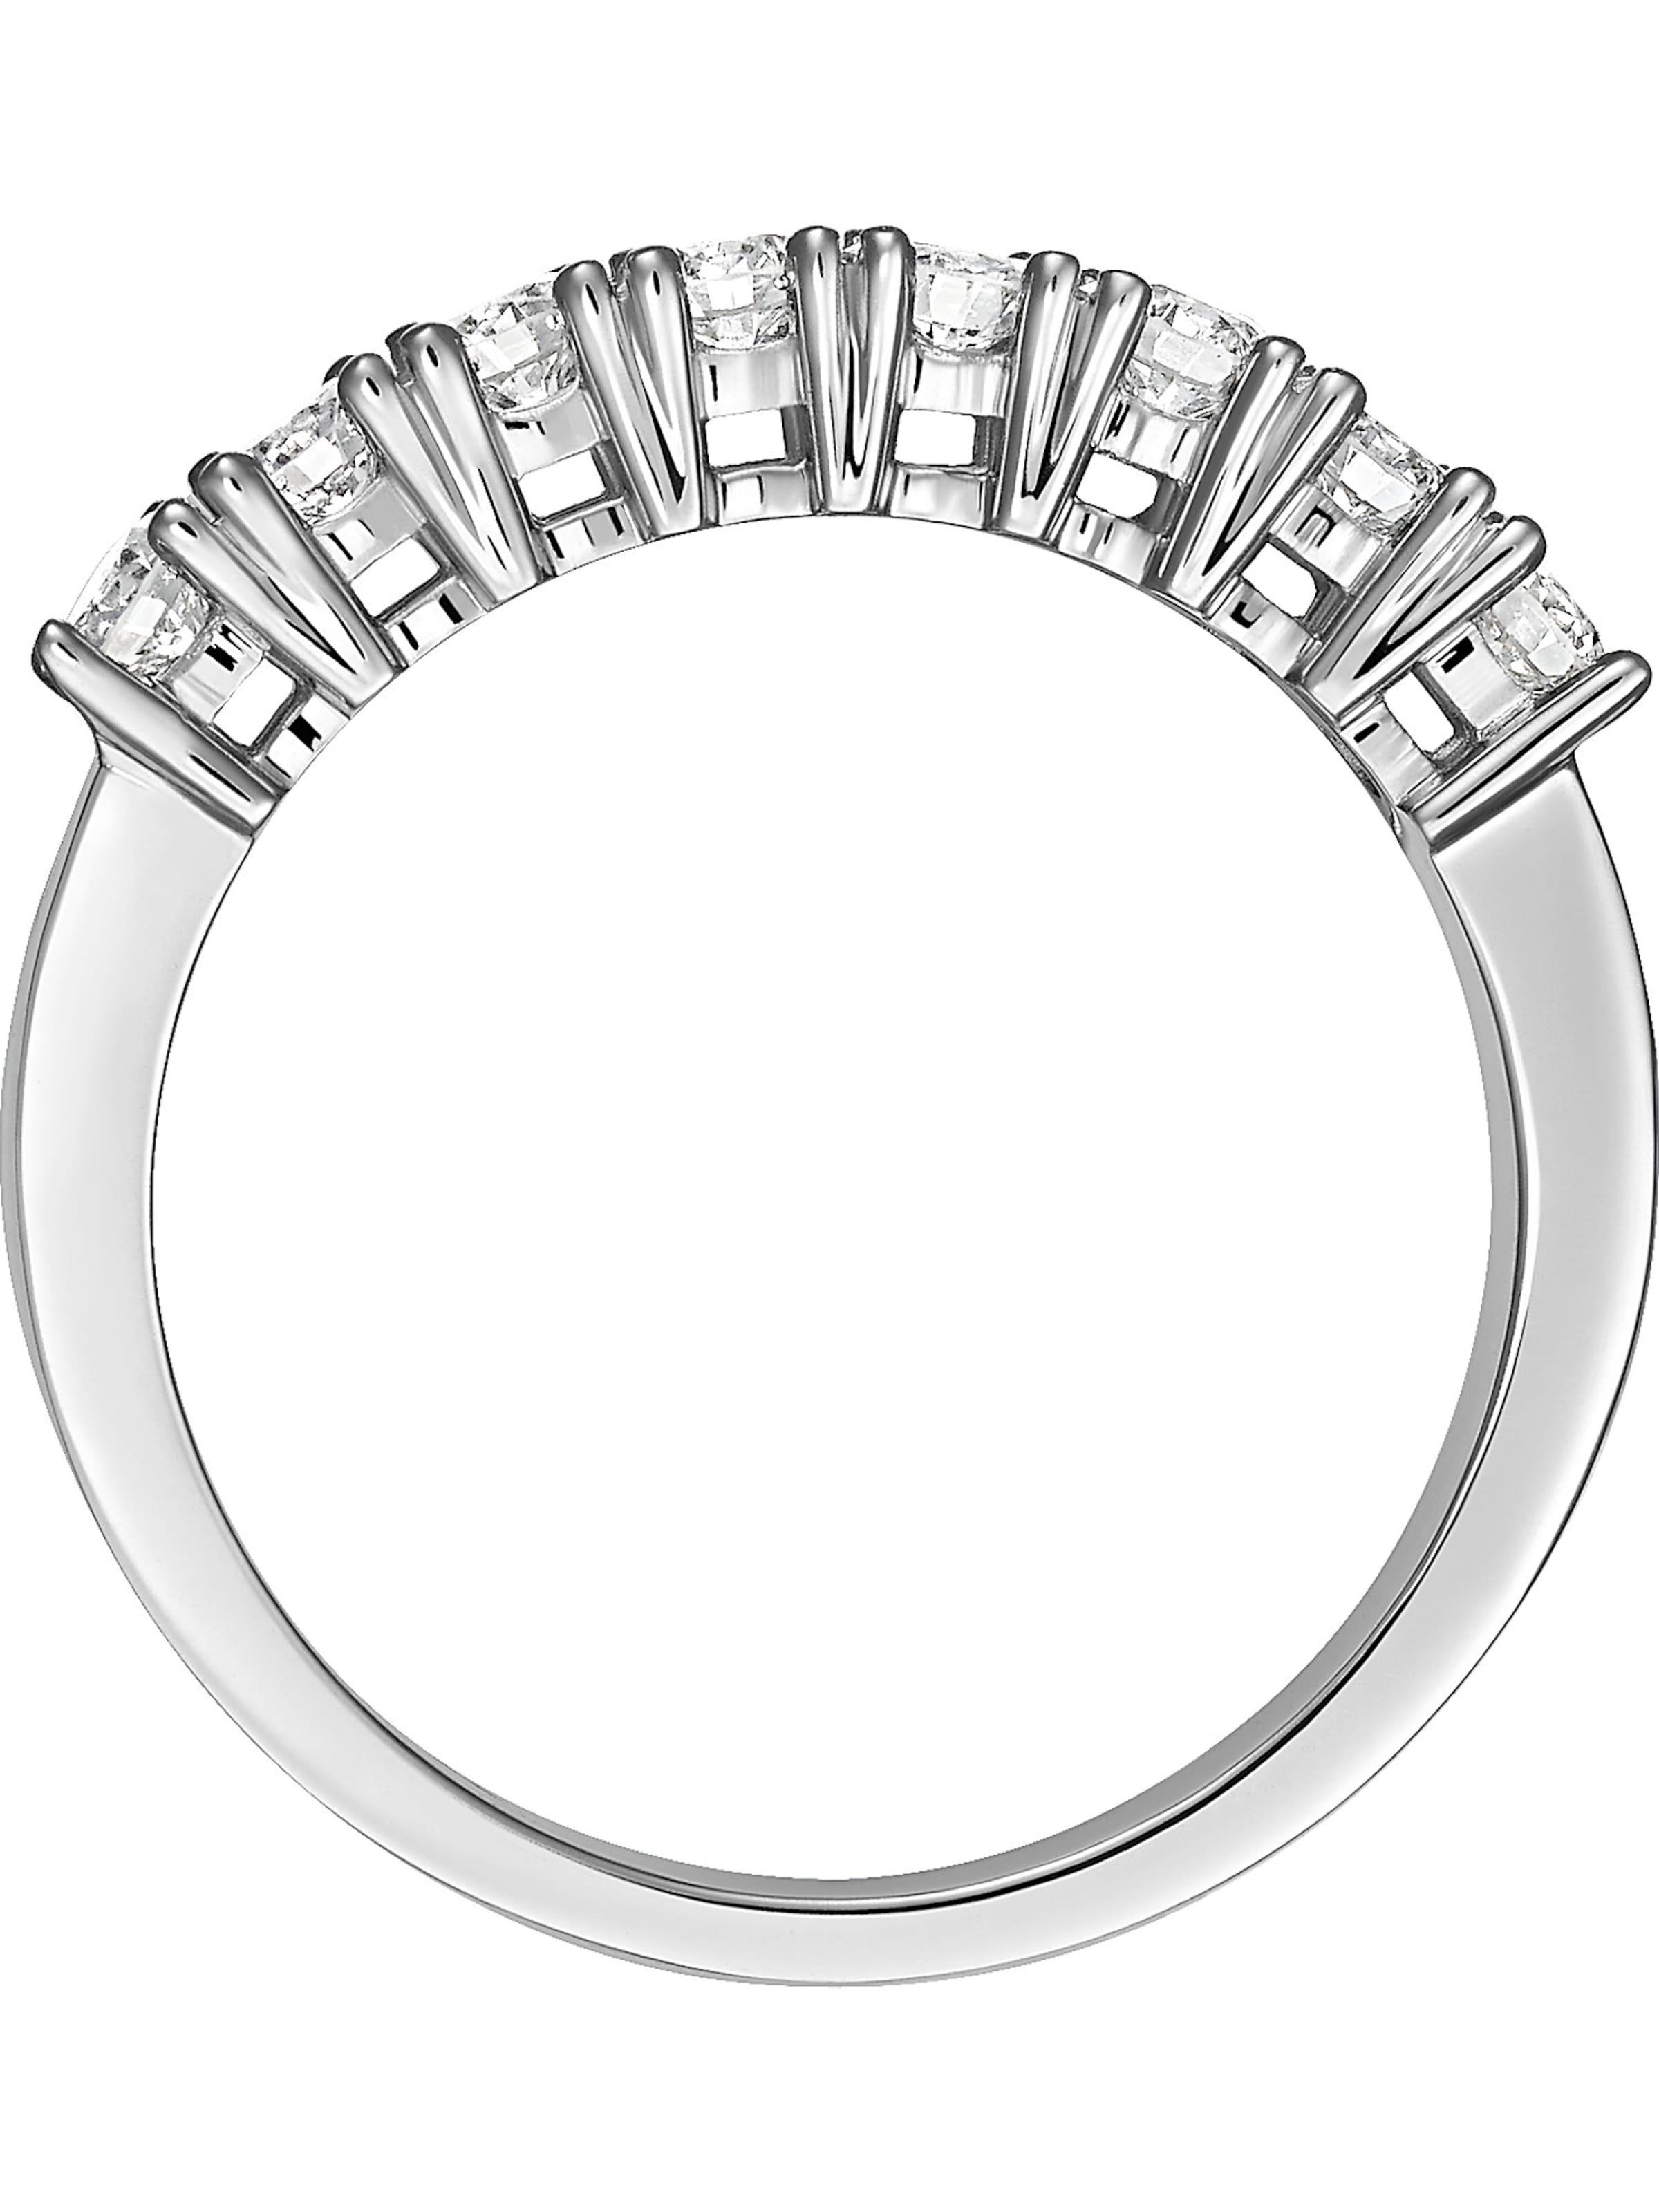 Ring Christ Christ SilberNaturweiß Ring In Christ In Christ Ring In SilberNaturweiß Ring SilberNaturweiß OPuXZki